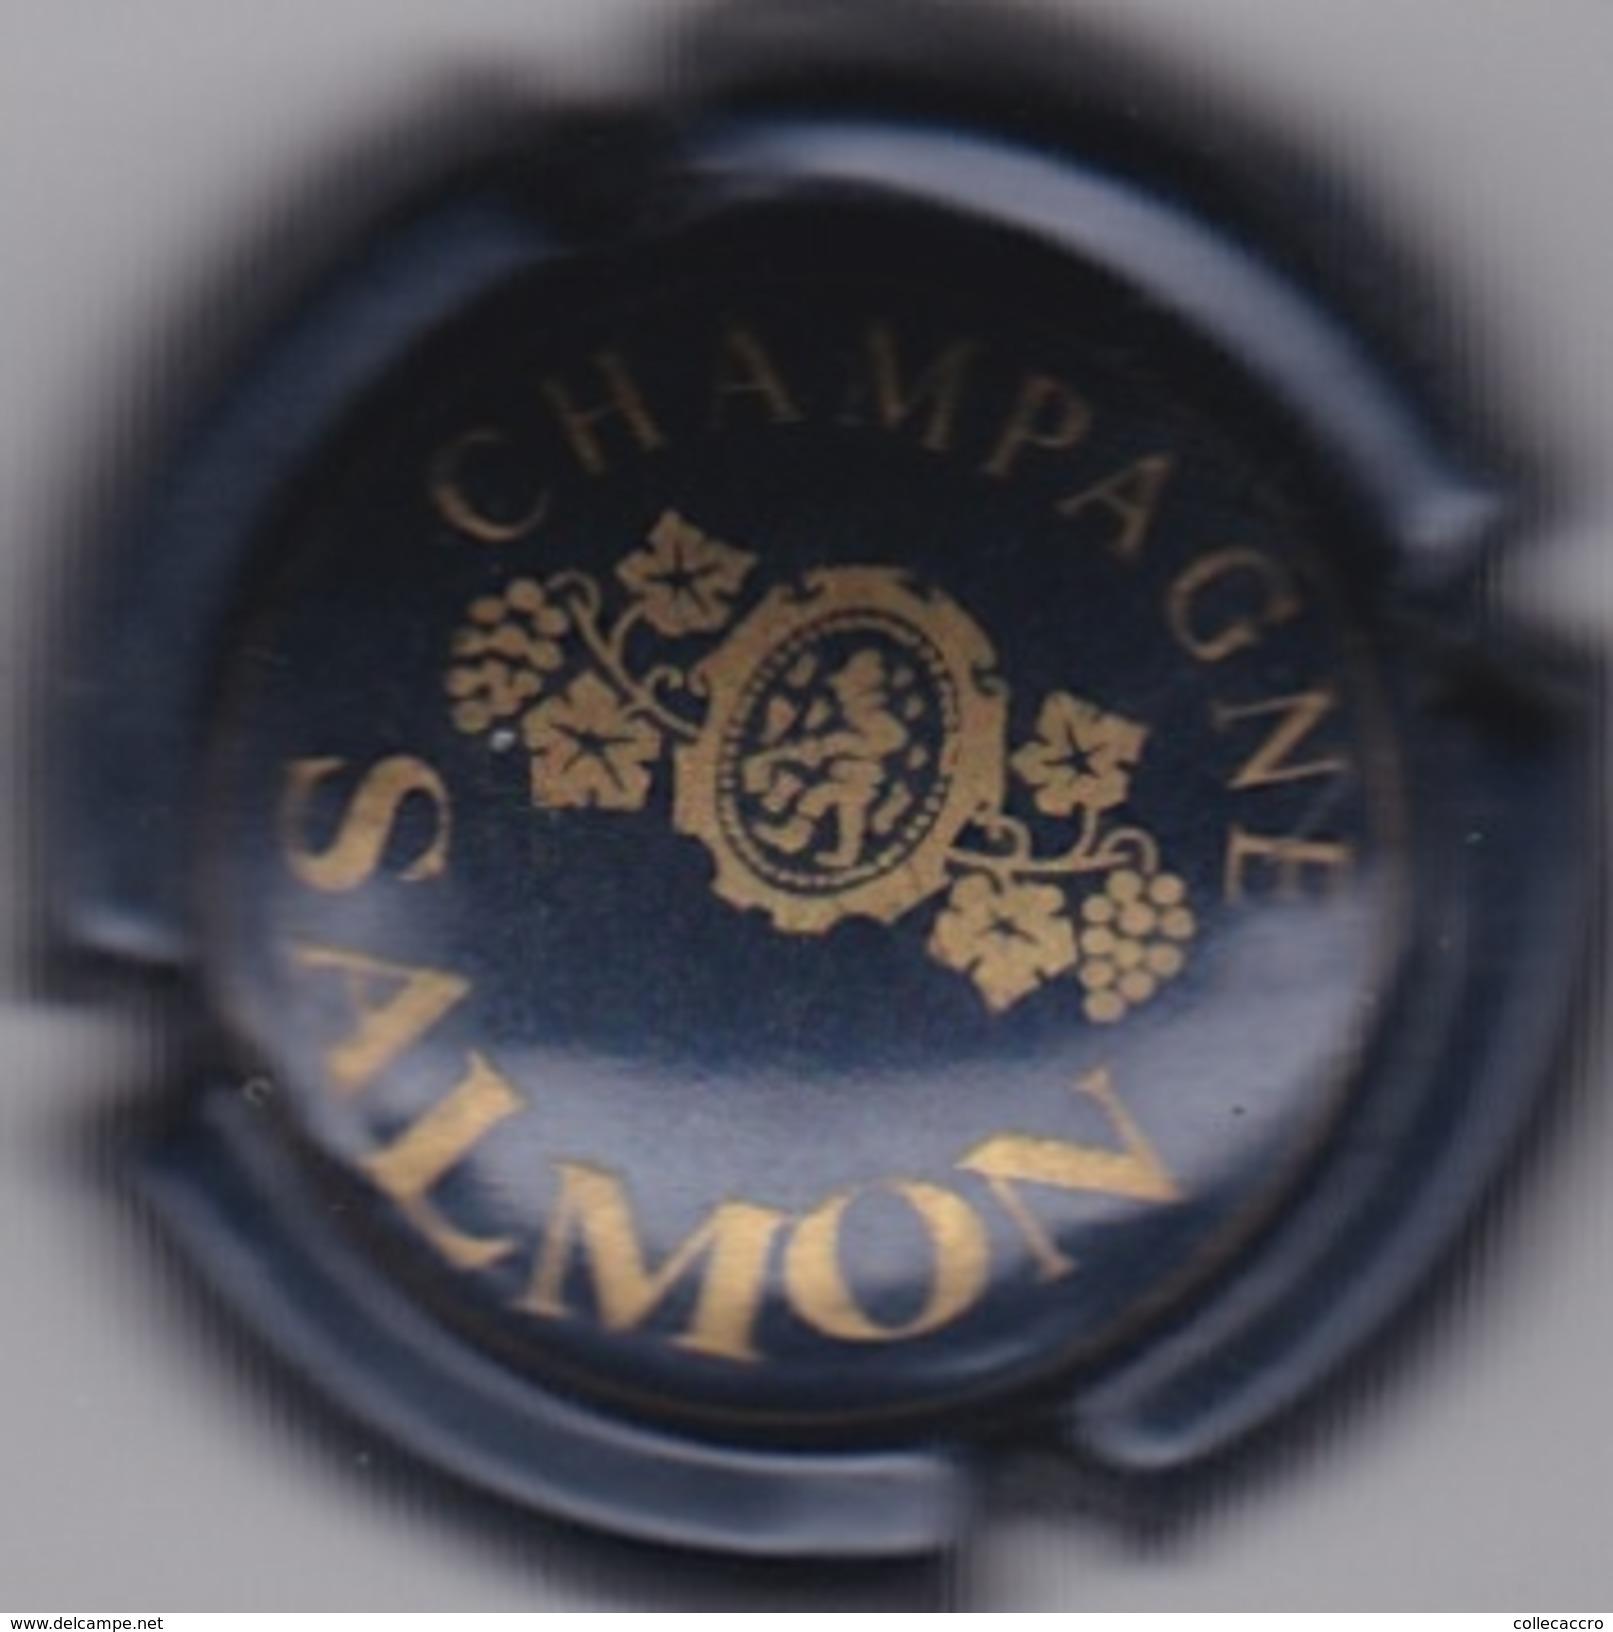 SALMON N°2 - Champagne